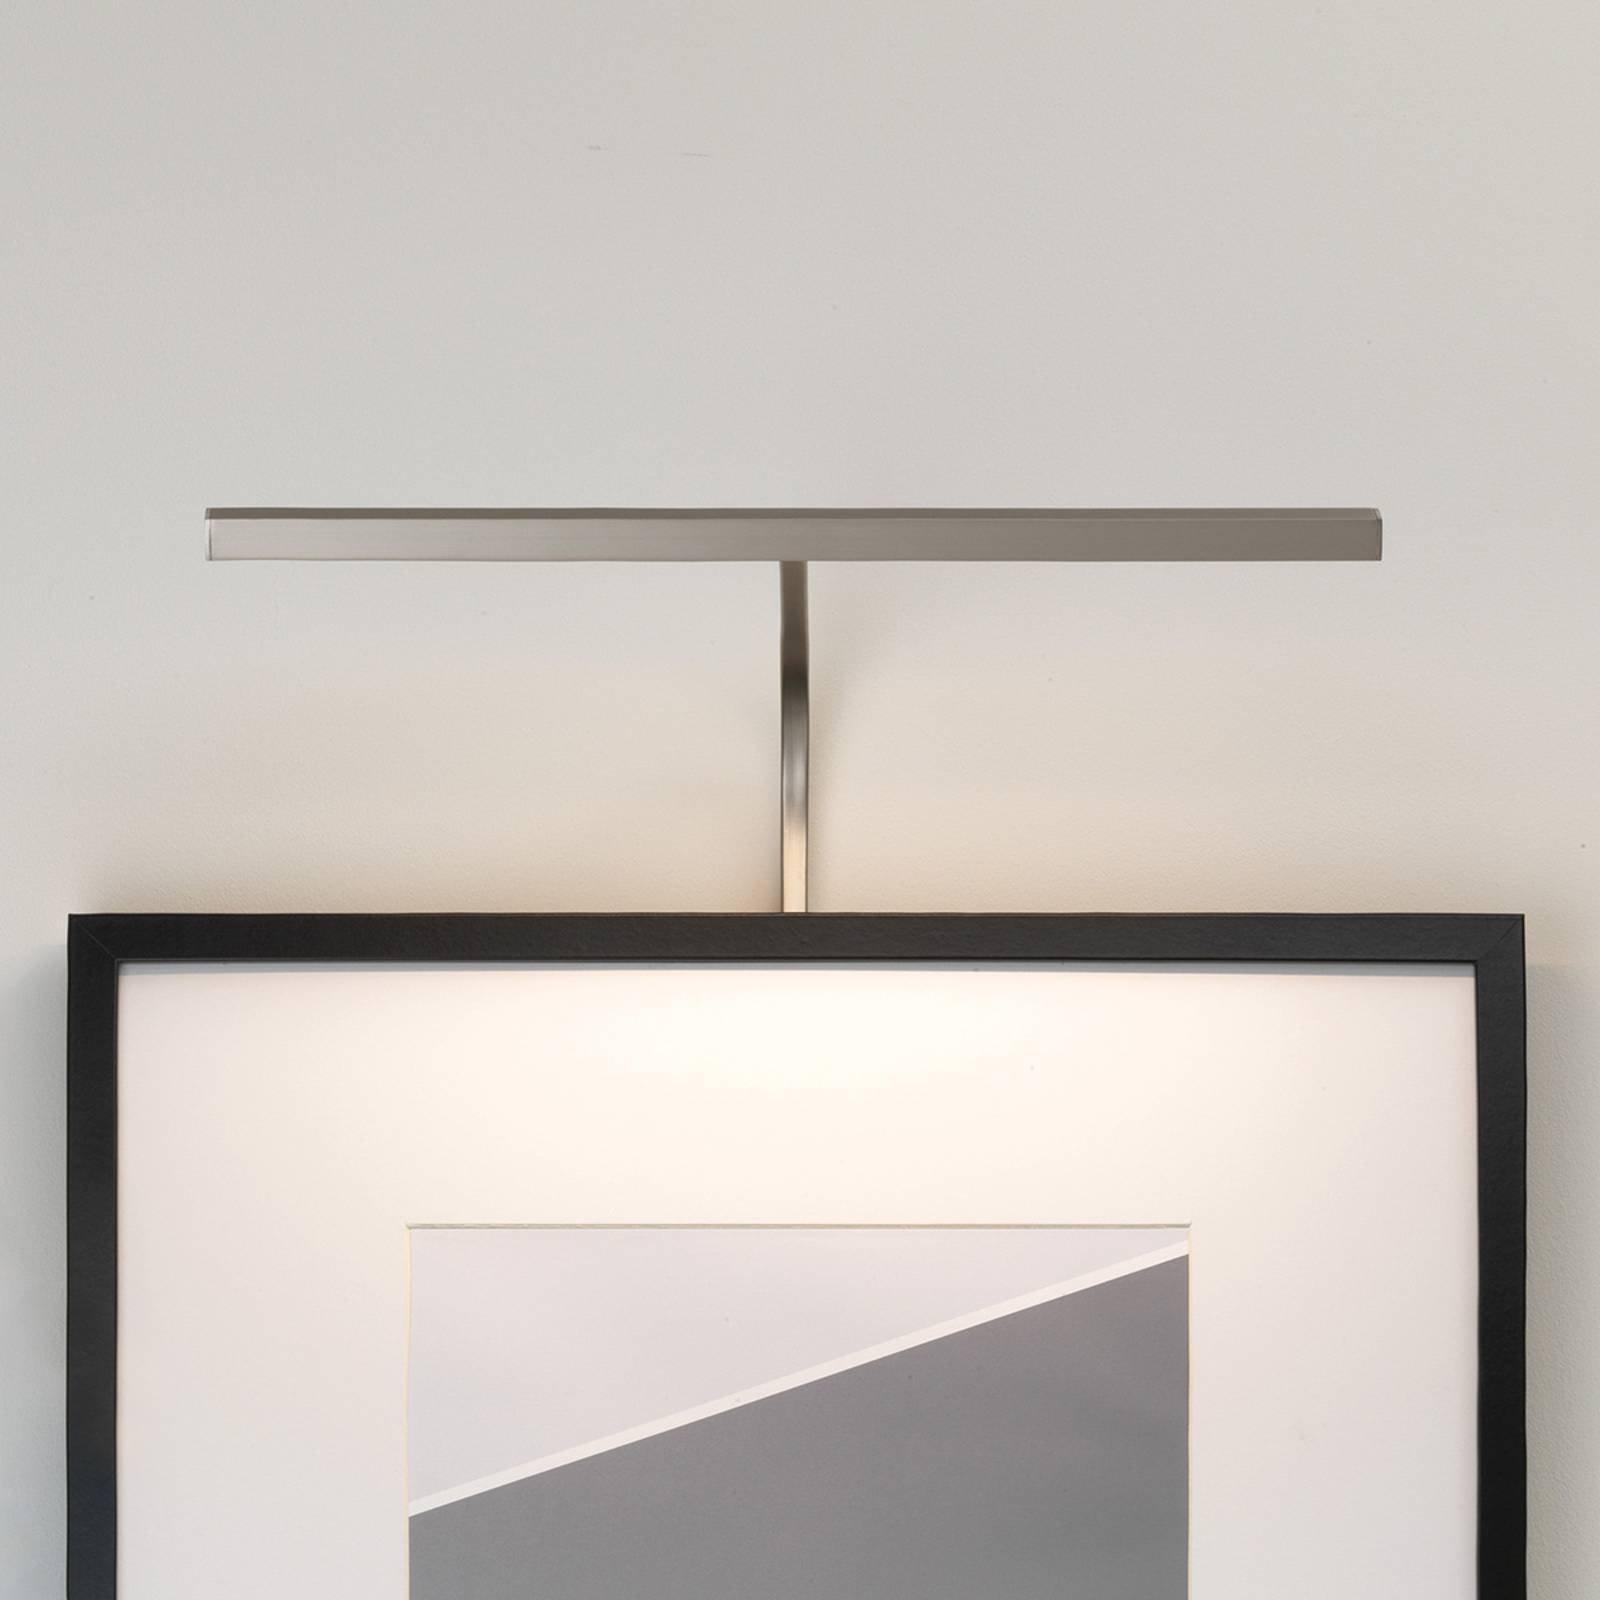 Astro Mondrian rammemont. vegglampe, nikkel 40 cm